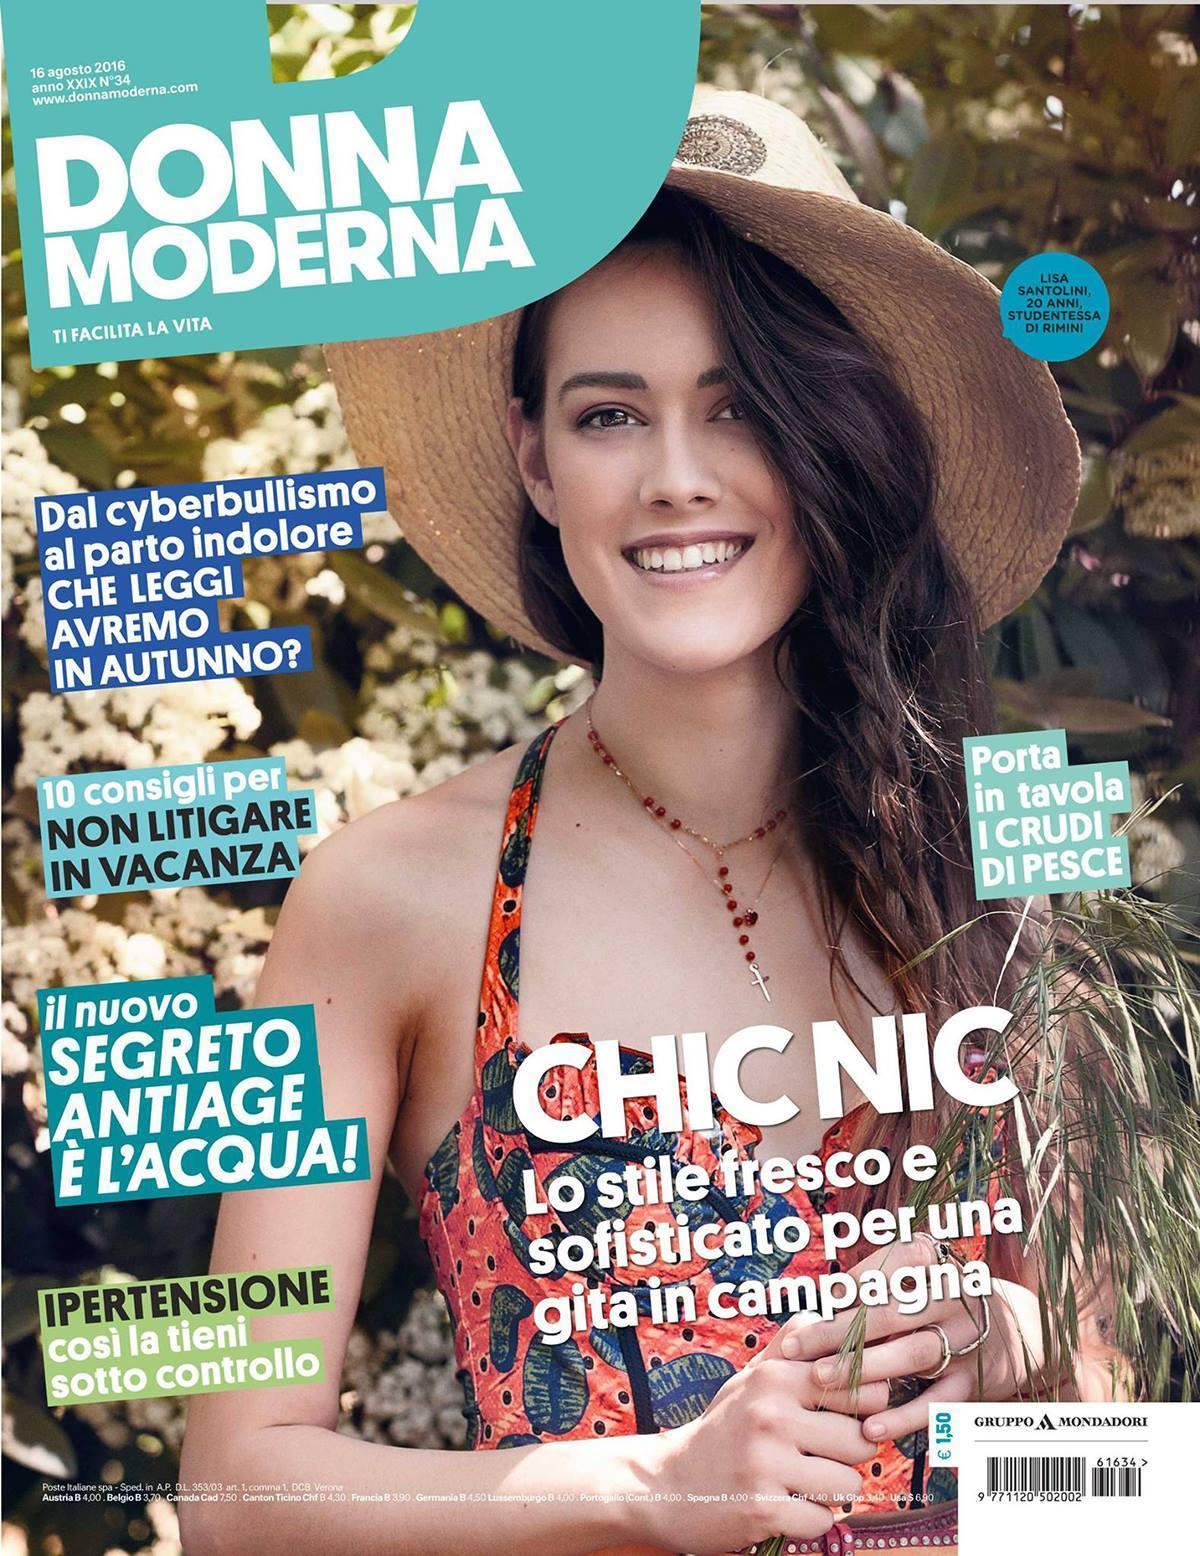 donna-moderna-chic-nic-agosto-2016